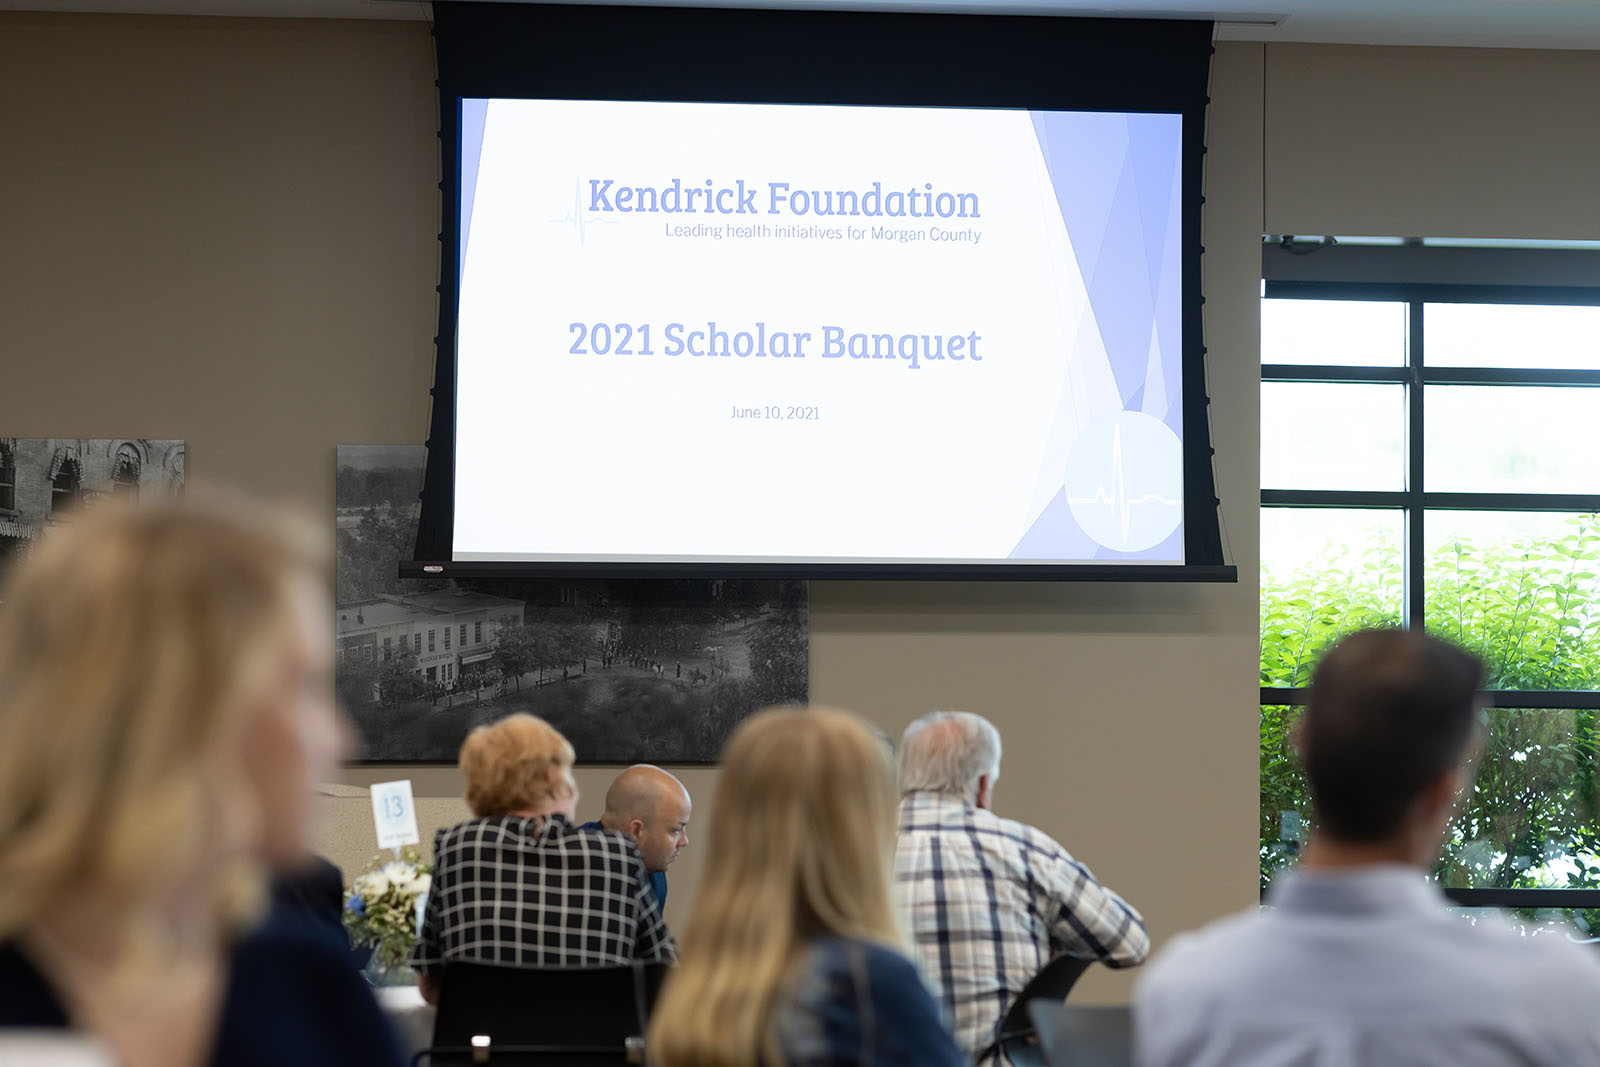 Scholar banquet slide